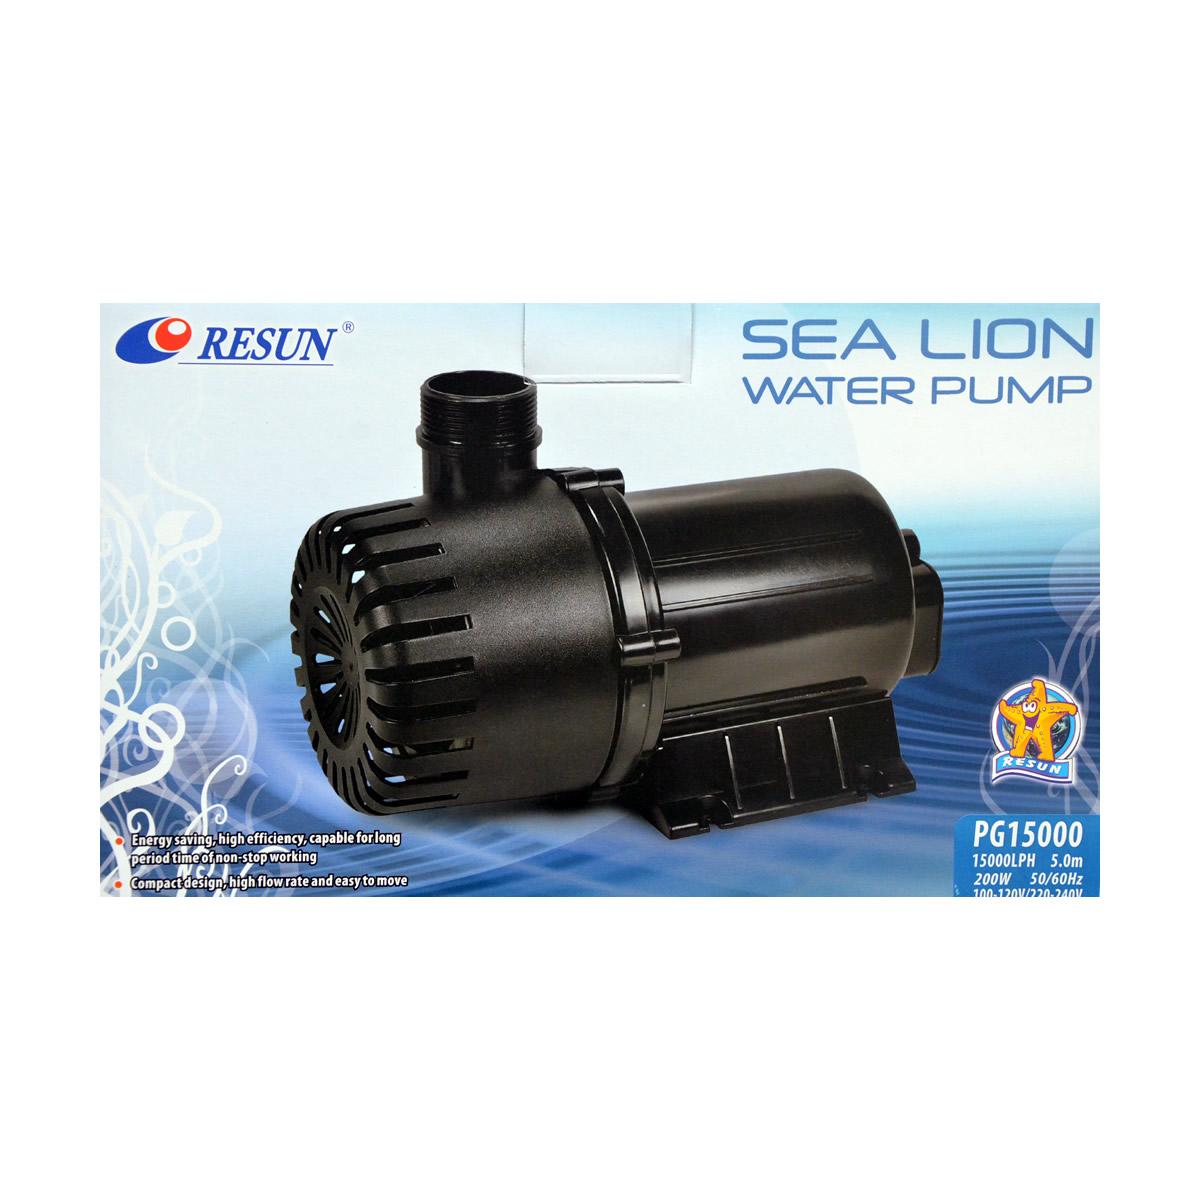 ReSun PG15000 Sea Lion Pond Circulation Water Pump 200W 15000L/H